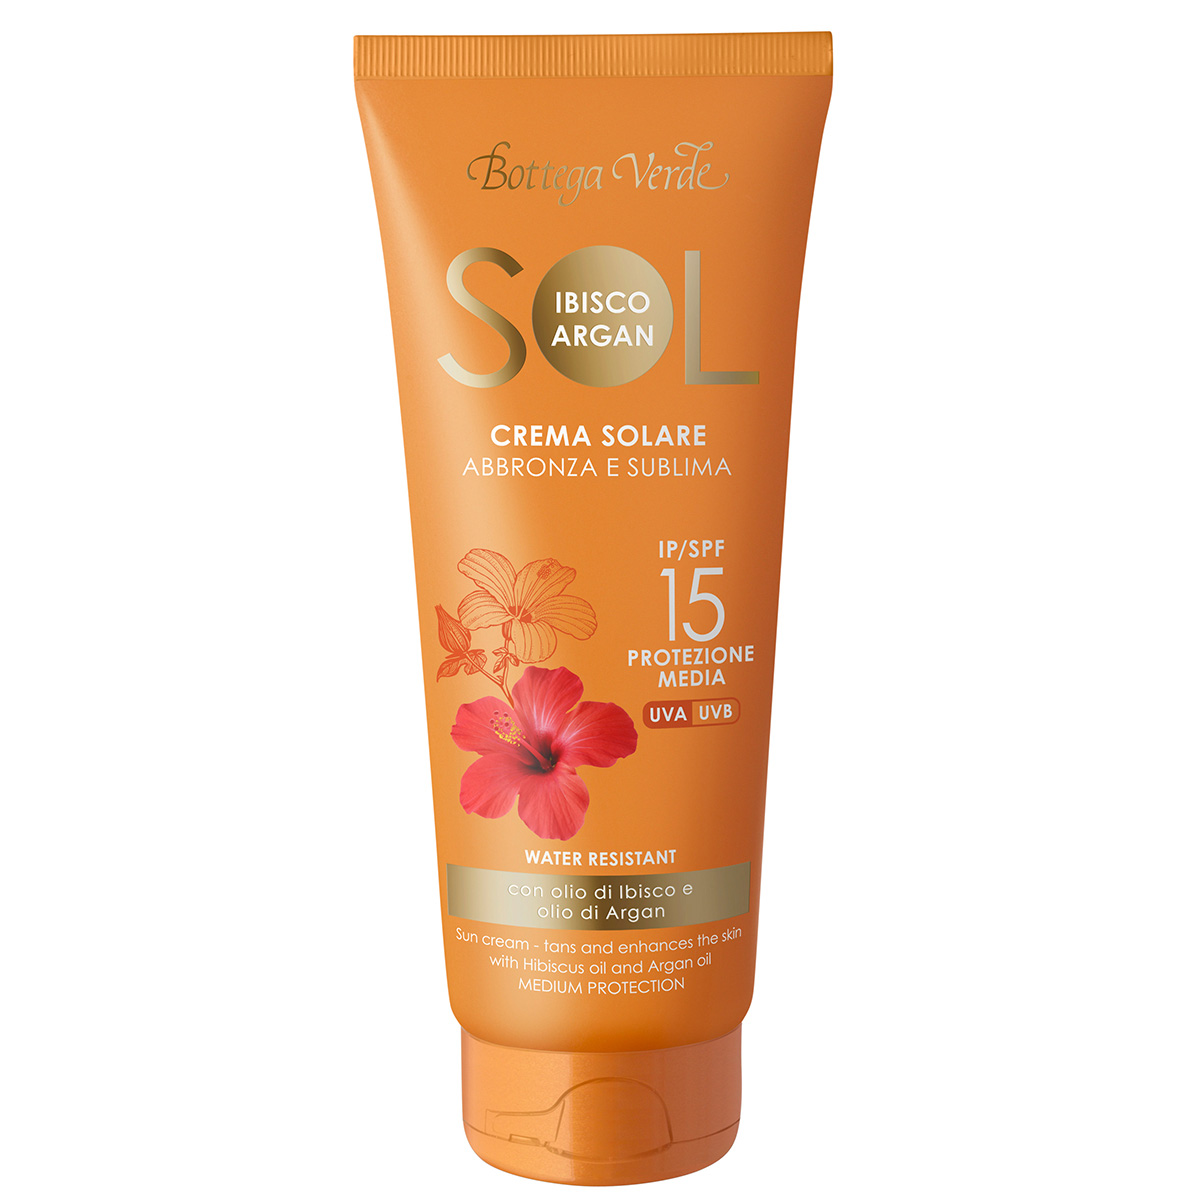 Crema pentru plaja cu ulei de hibiscus si argan - waterproof - Sol Ibisco Argan, 200 ML